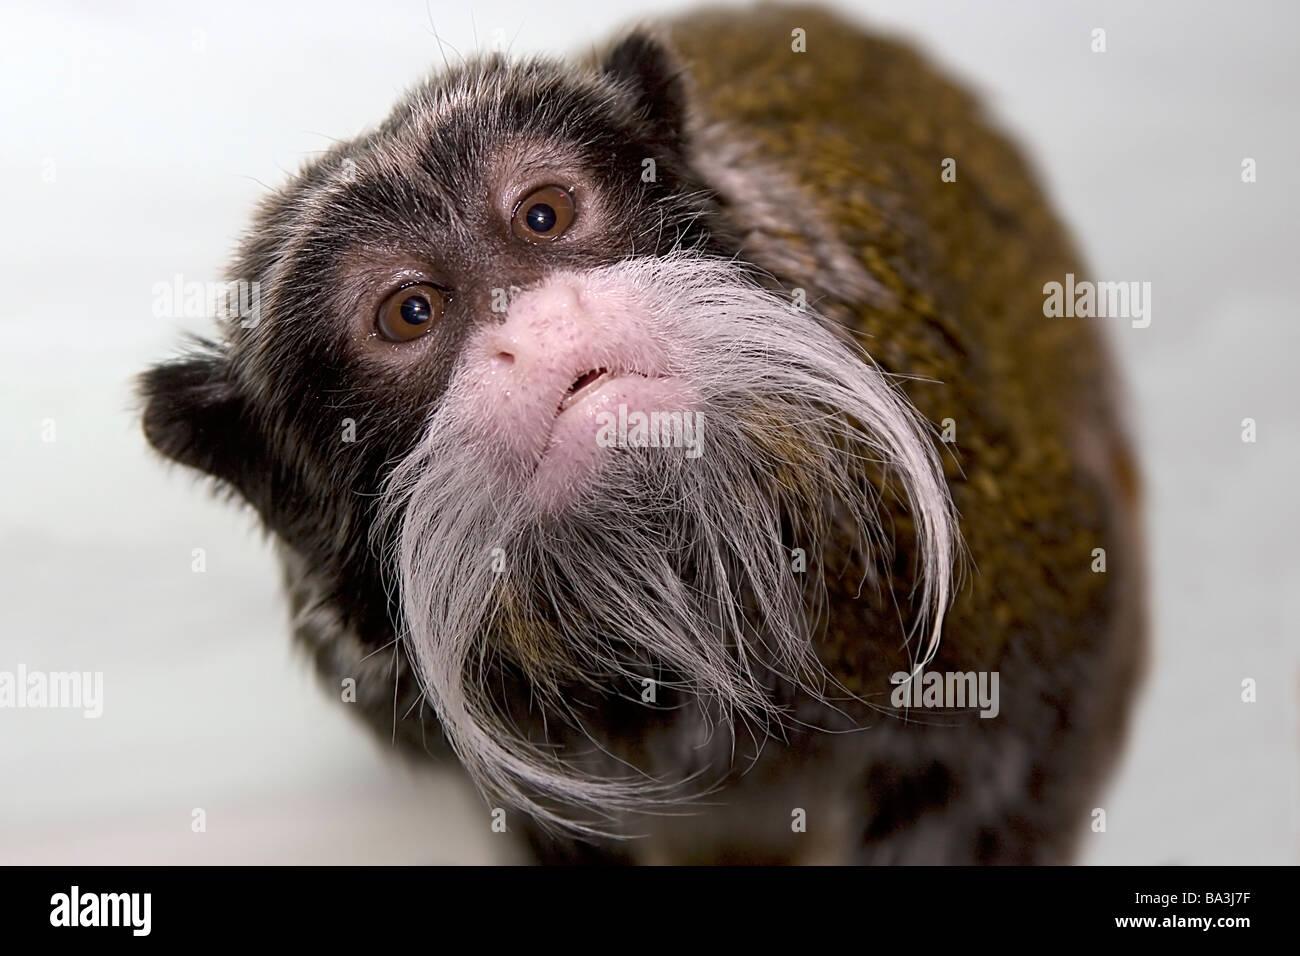 L'imperatore Tamarin curiosi nosey Cheeky Monkey baffi Saguinus imperator Immagini Stock